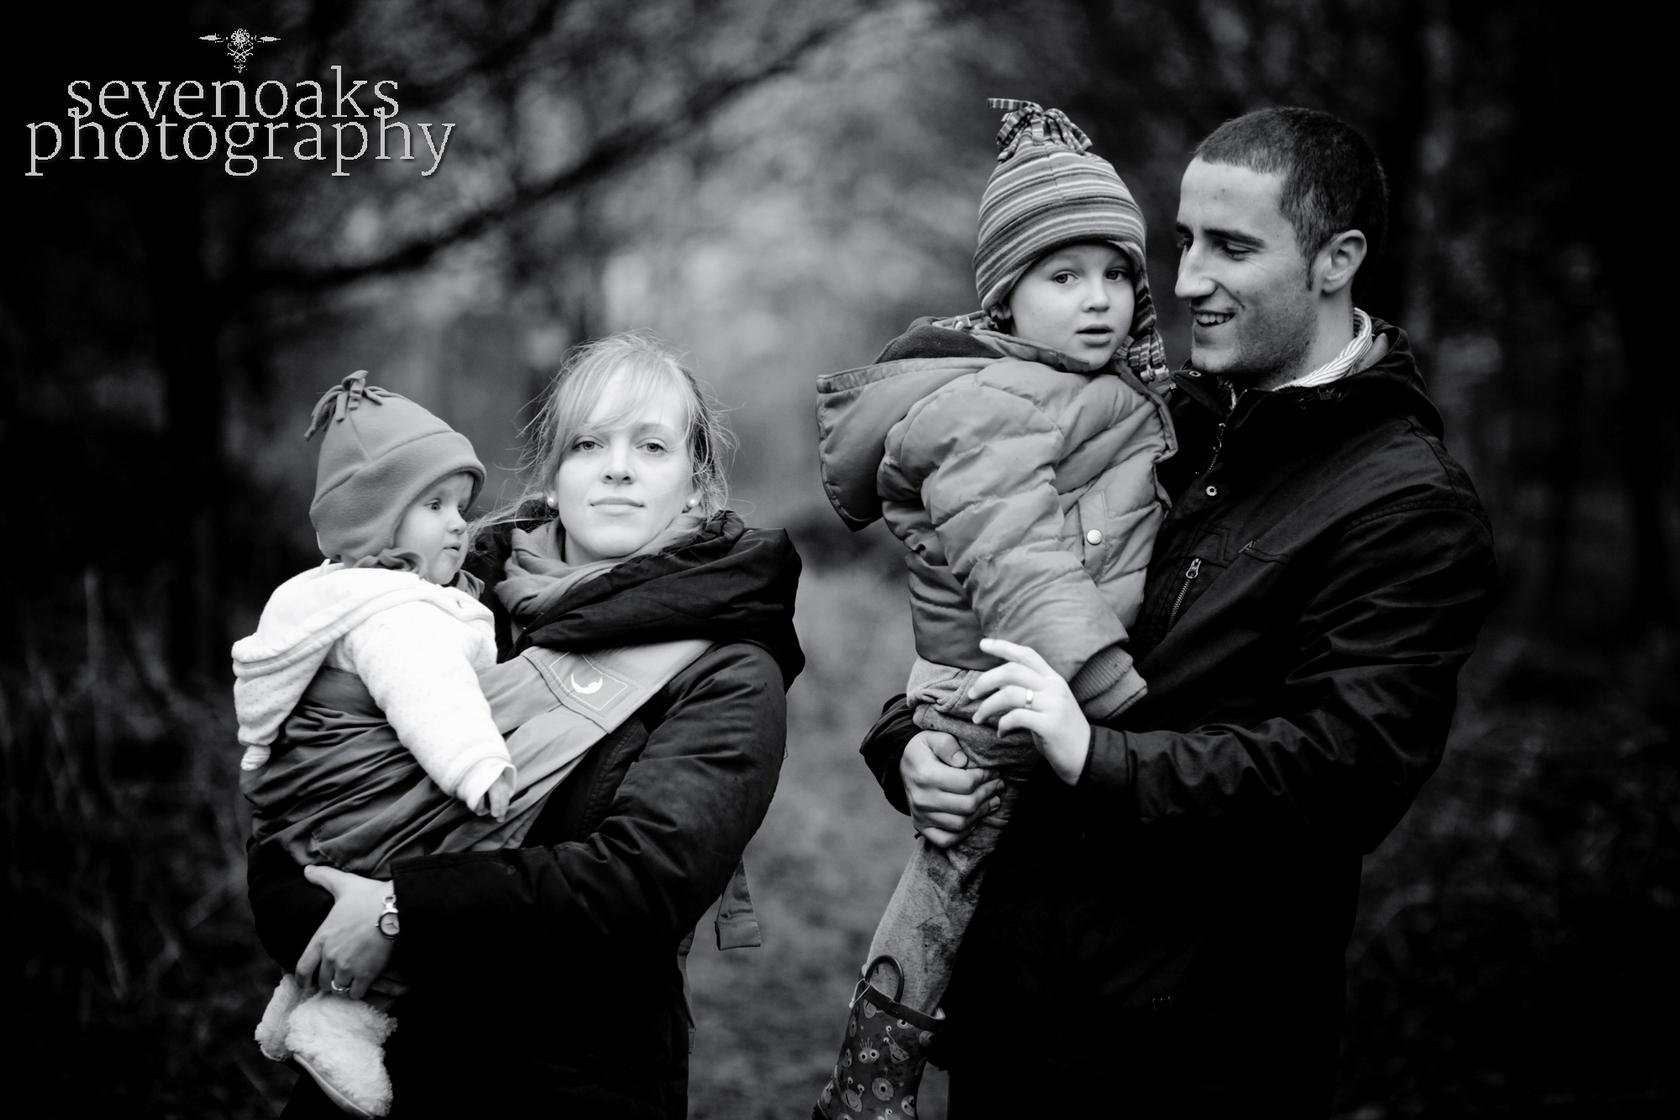 sevenoaks portrait photographer-22.jpg